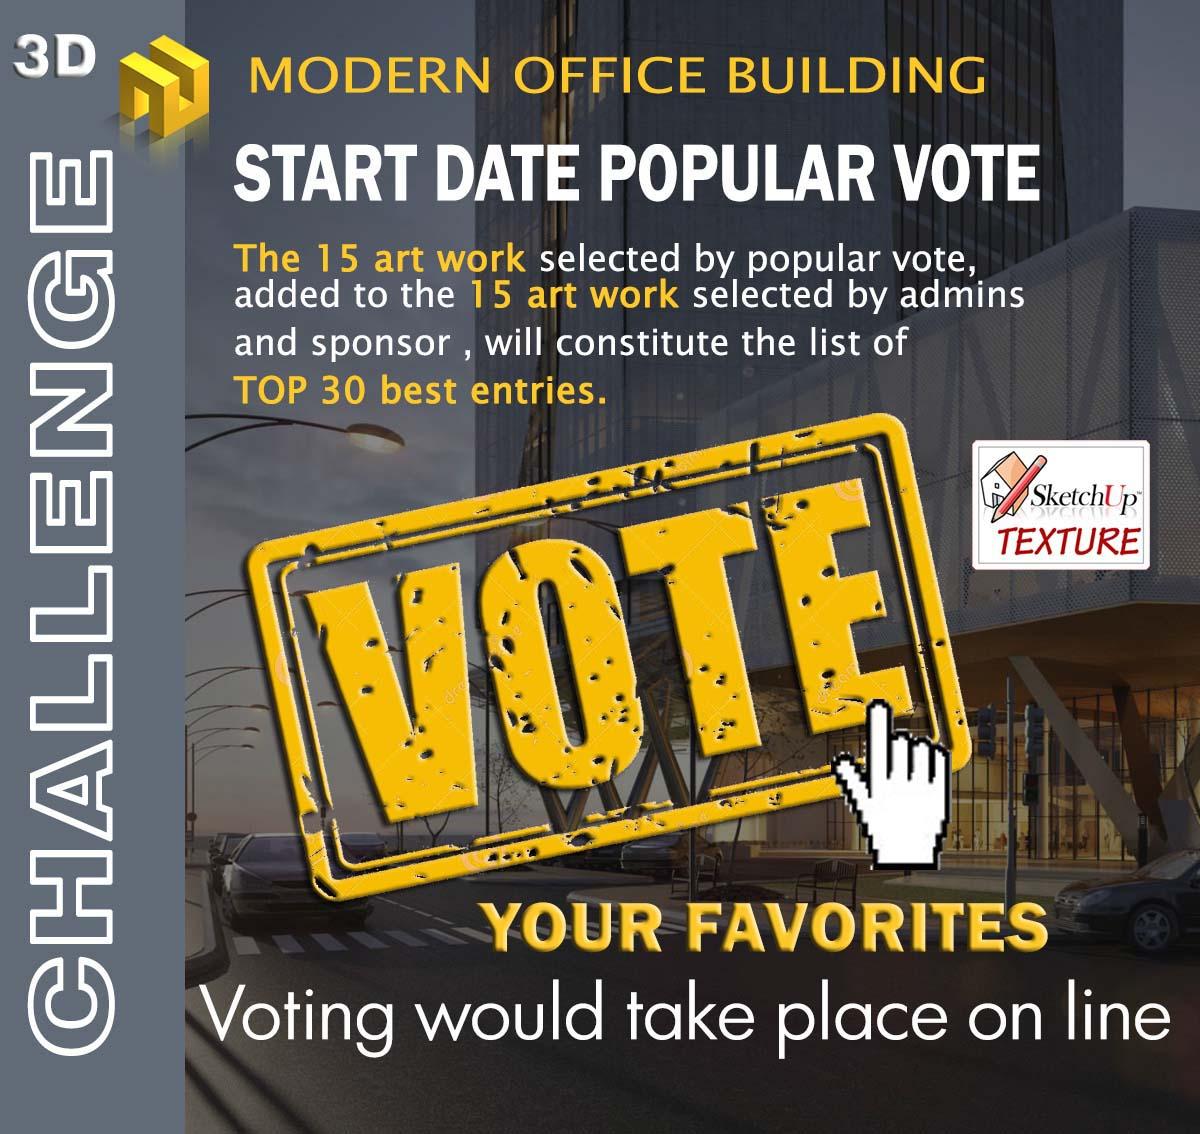 3d challenge modern office bouilding  render contest voting